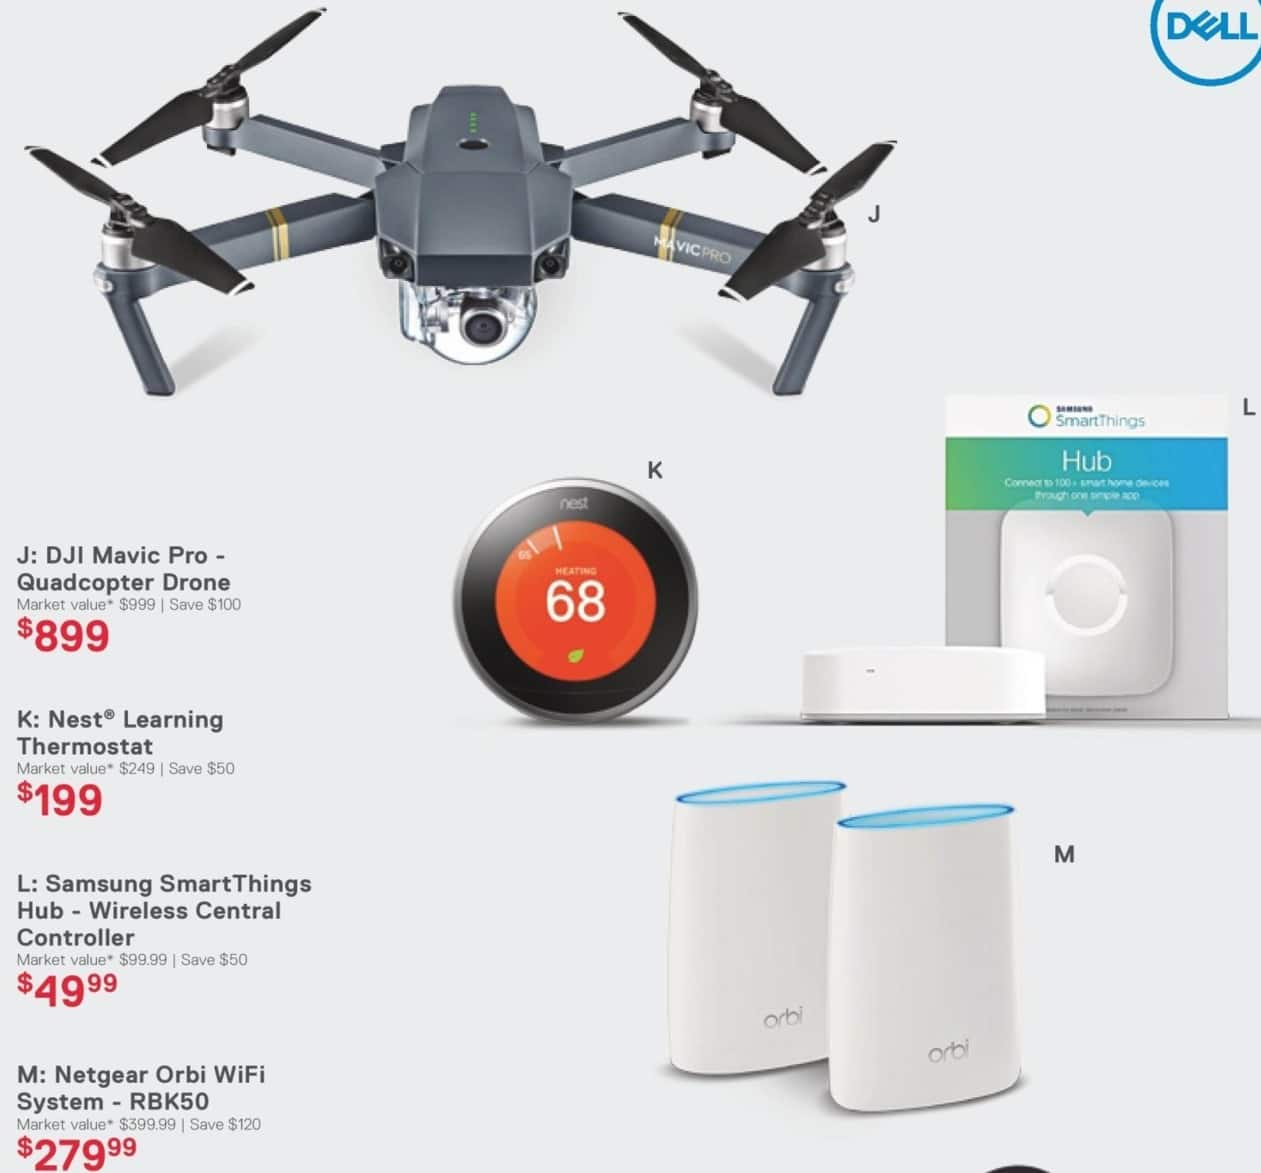 Dell Home & Office Cyber Monday: DJI Mavic Pro Quadcopter Drone for $899.00